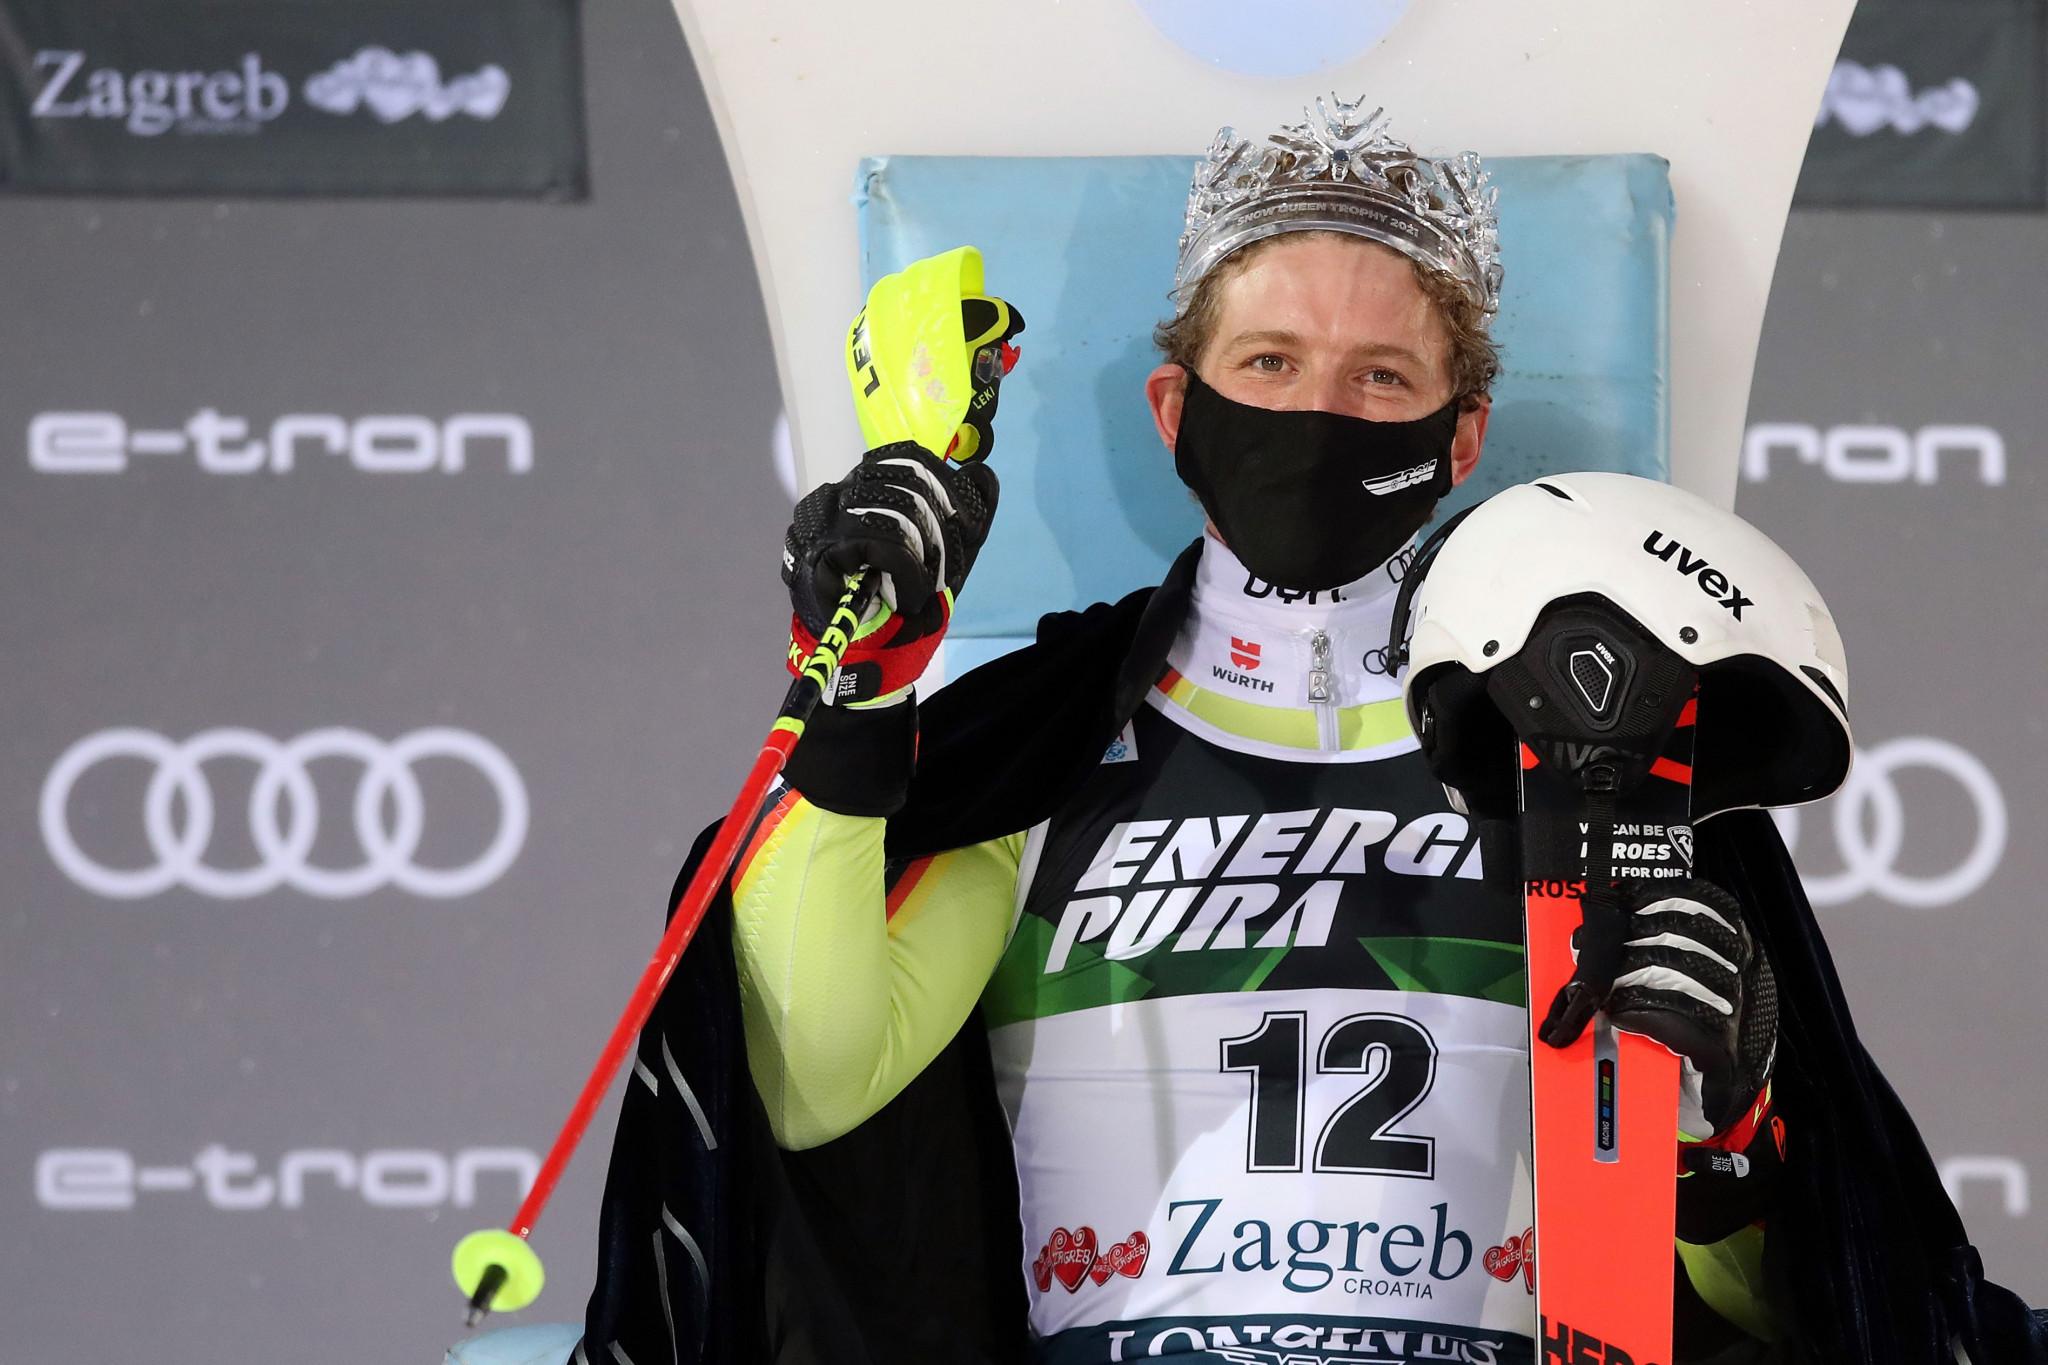 Strasser earns surprise win at FIS Alpine Ski World Cup in Zagreb